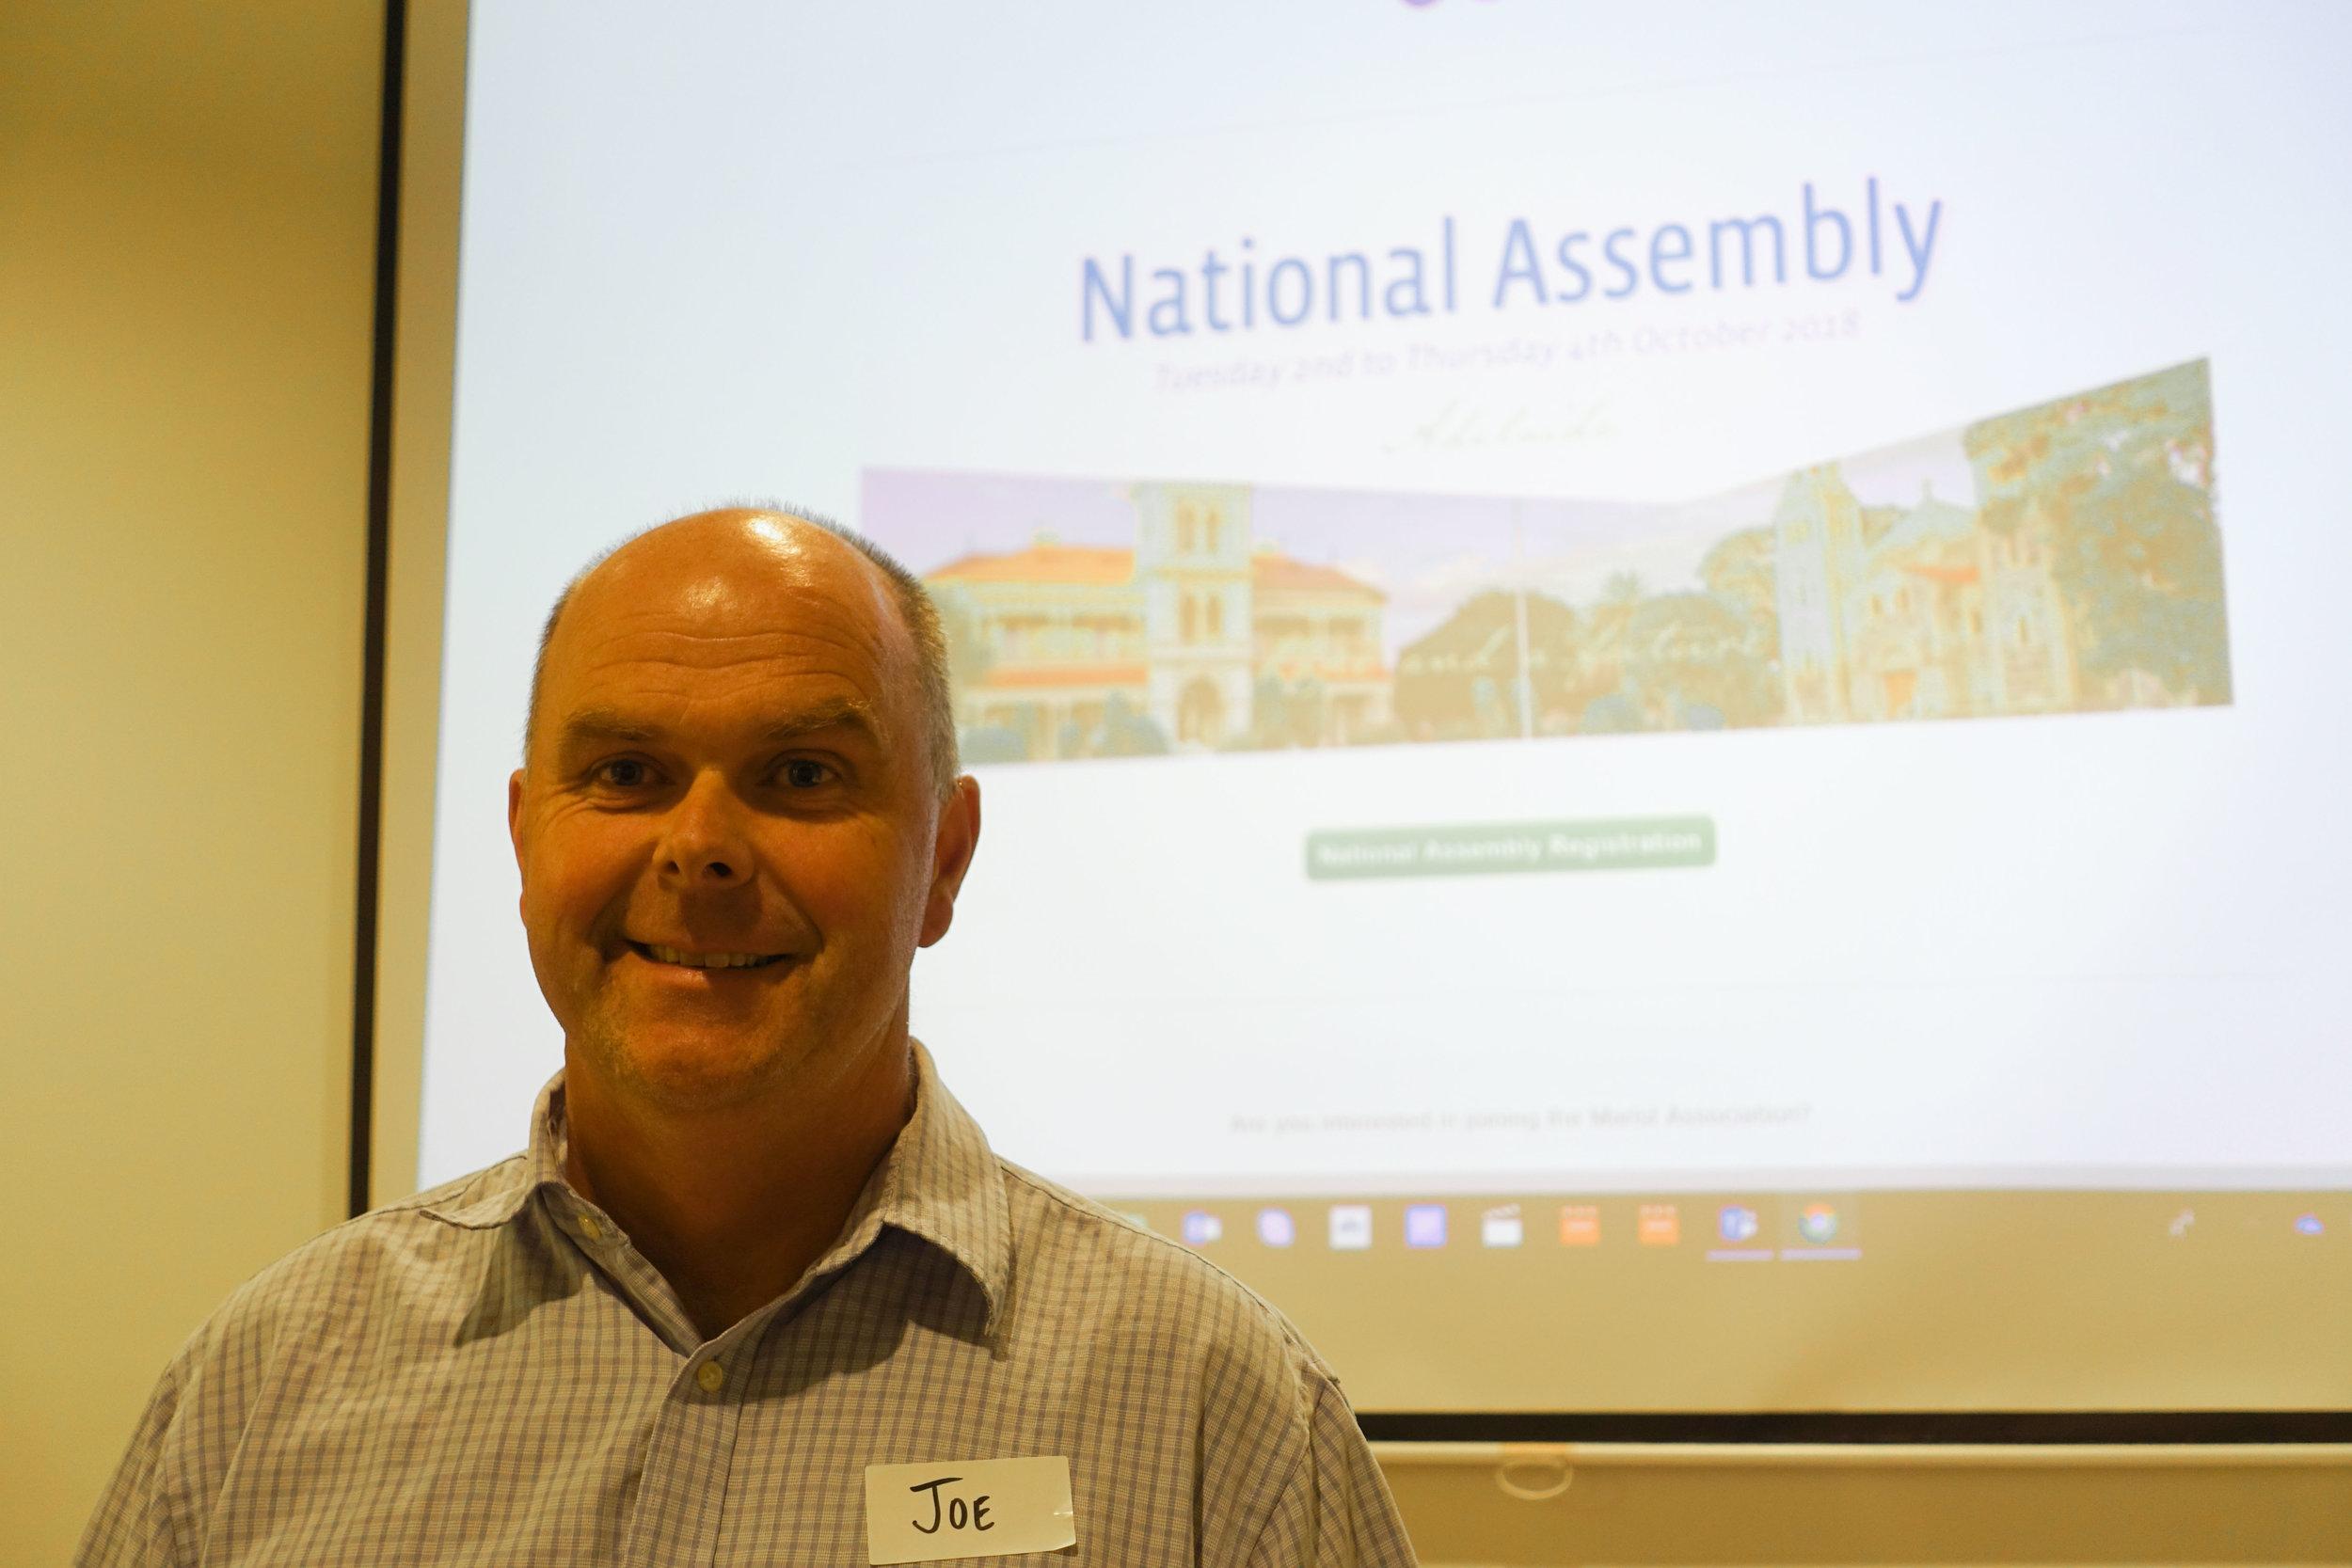 Our Deputy Leader - Joe McCarthy